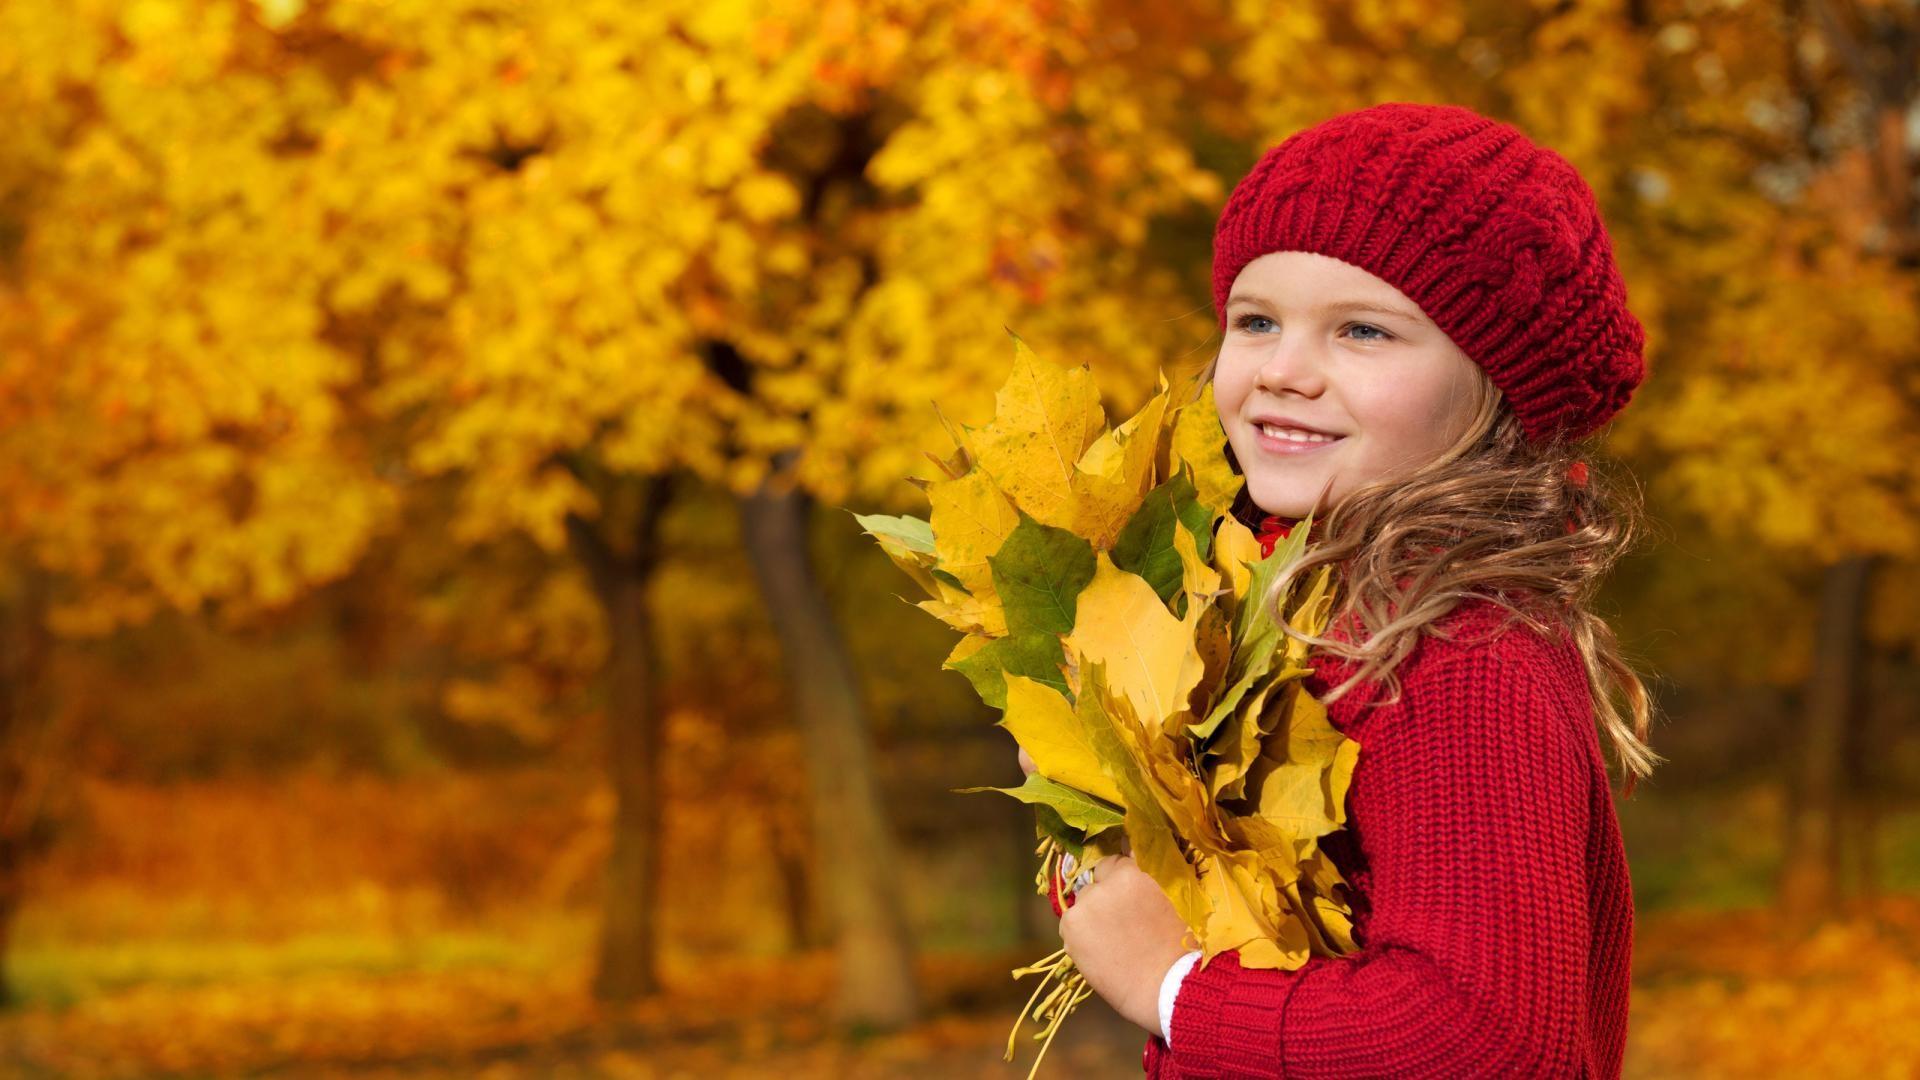 Cute Baby Girl in Autumn Season